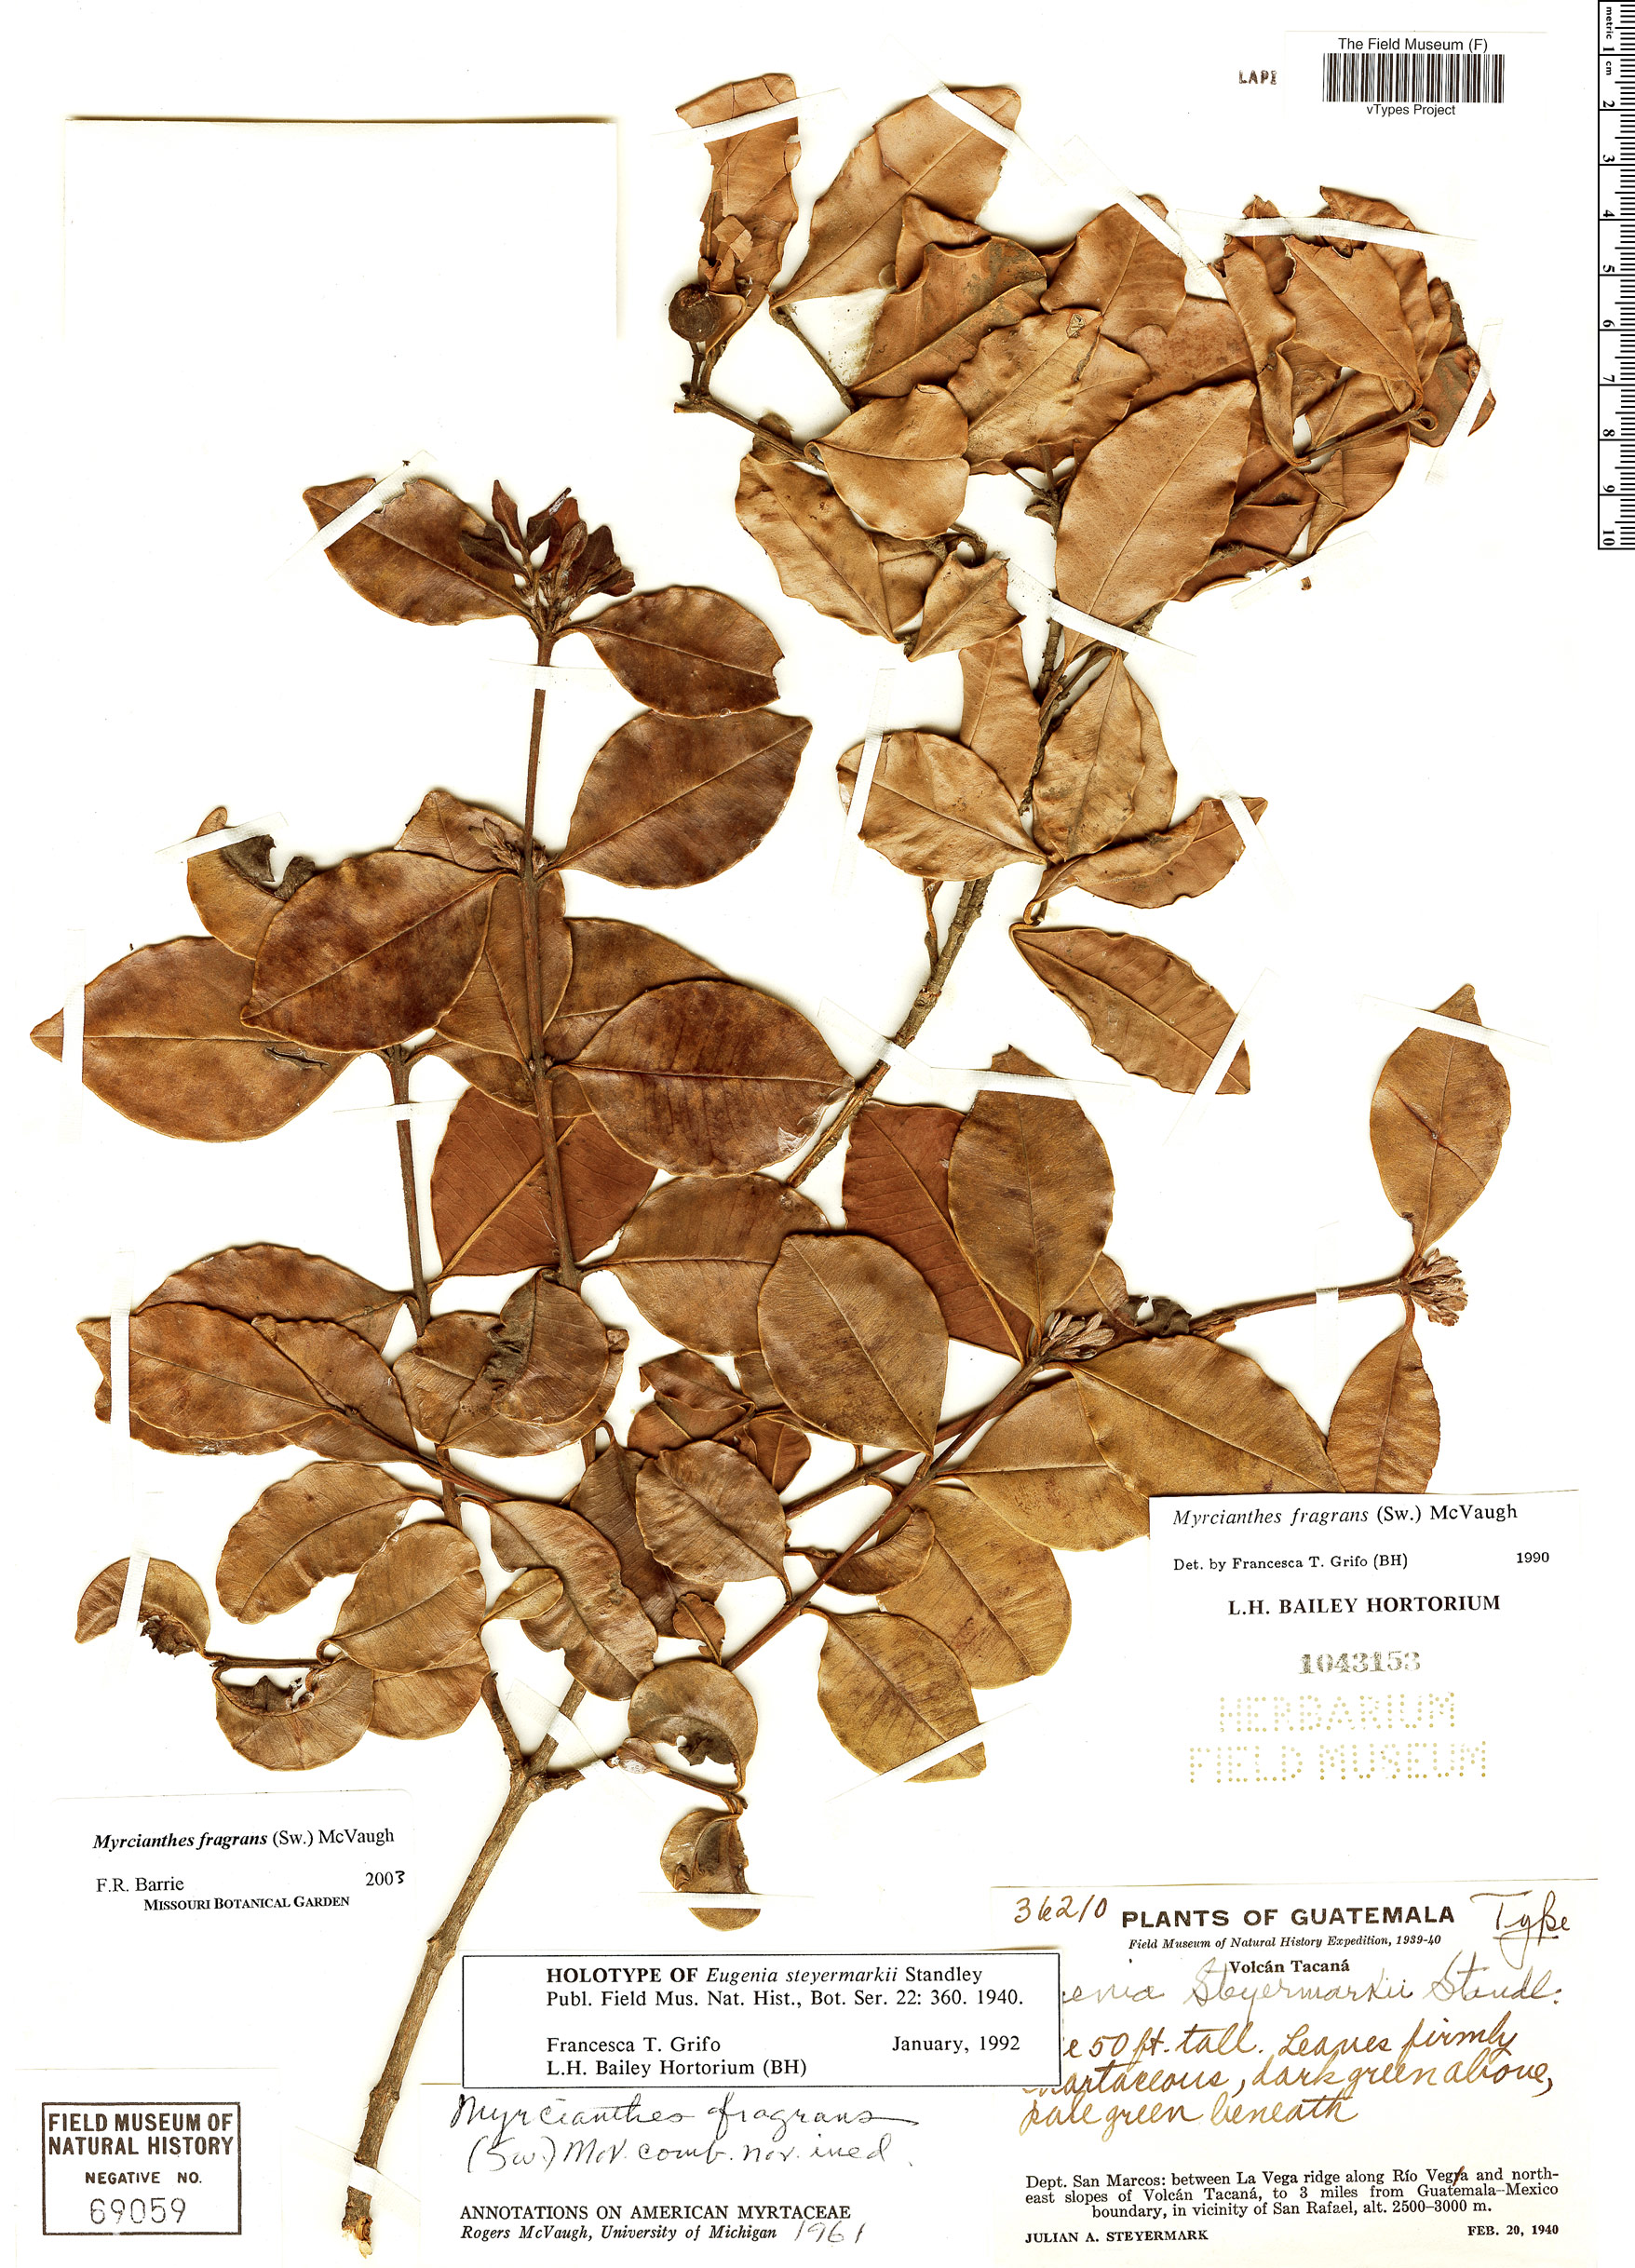 Specimen: Eugenia steyermarkii